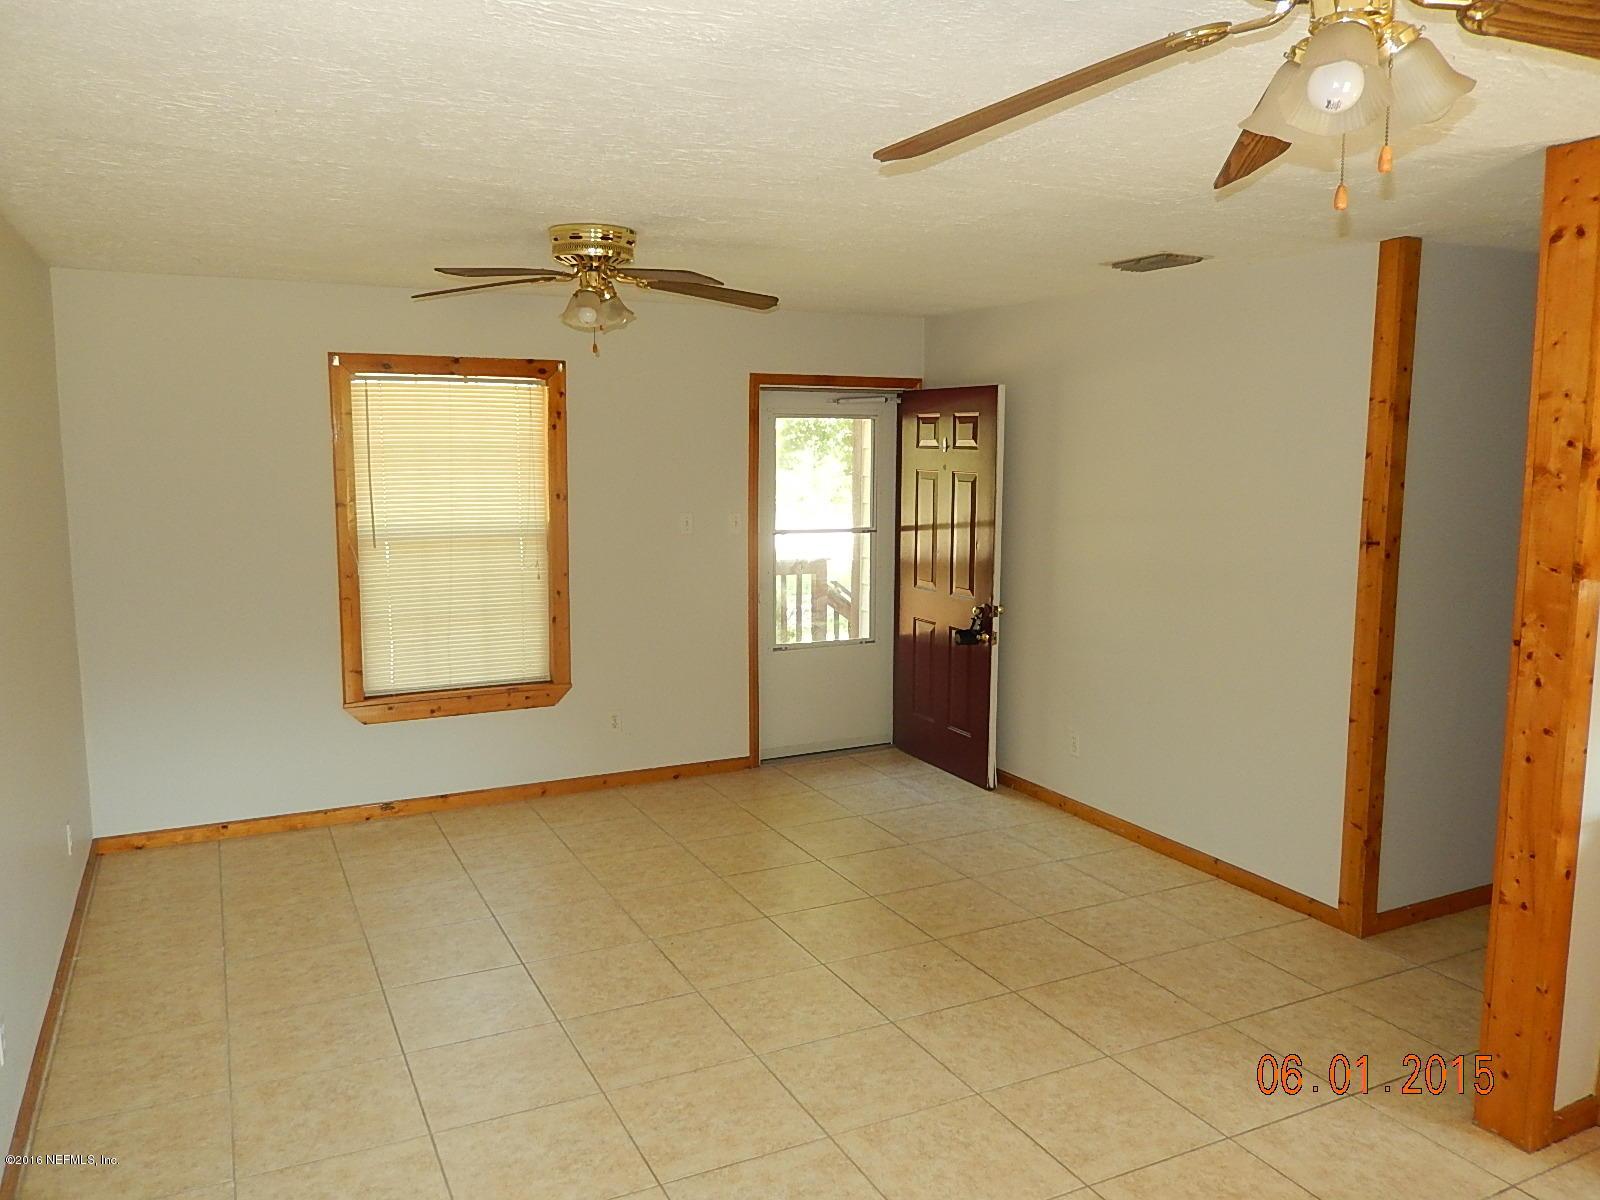 140 PIONEER, PALATKA, FLORIDA 32043, 3 Bedrooms Bedrooms, ,1 BathroomBathrooms,Residential - single family,For sale,PIONEER,830798